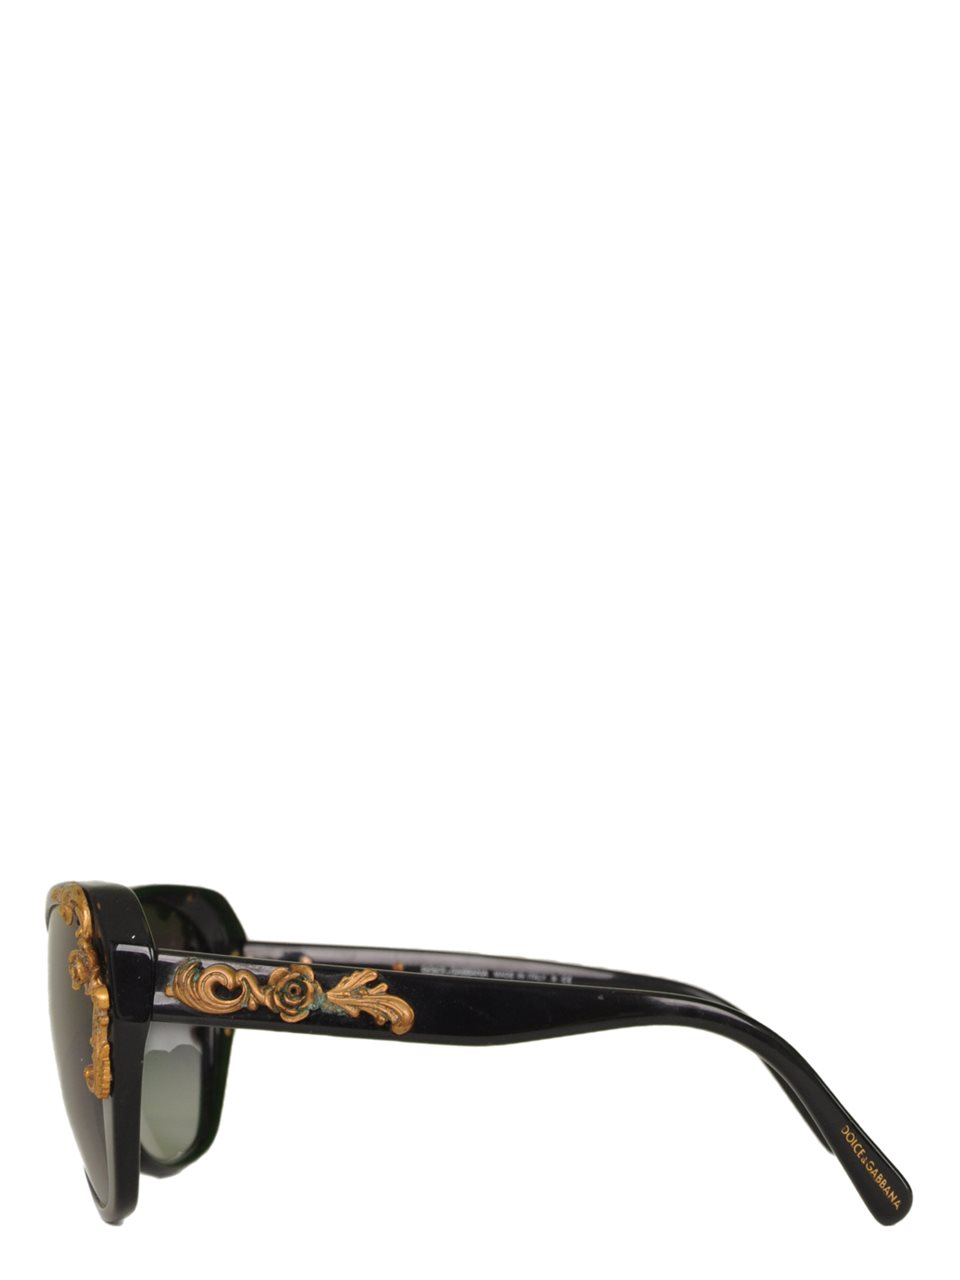 Dolce & Gabbana - Sicilian Baroque Sunglasses - Image 2 of 4